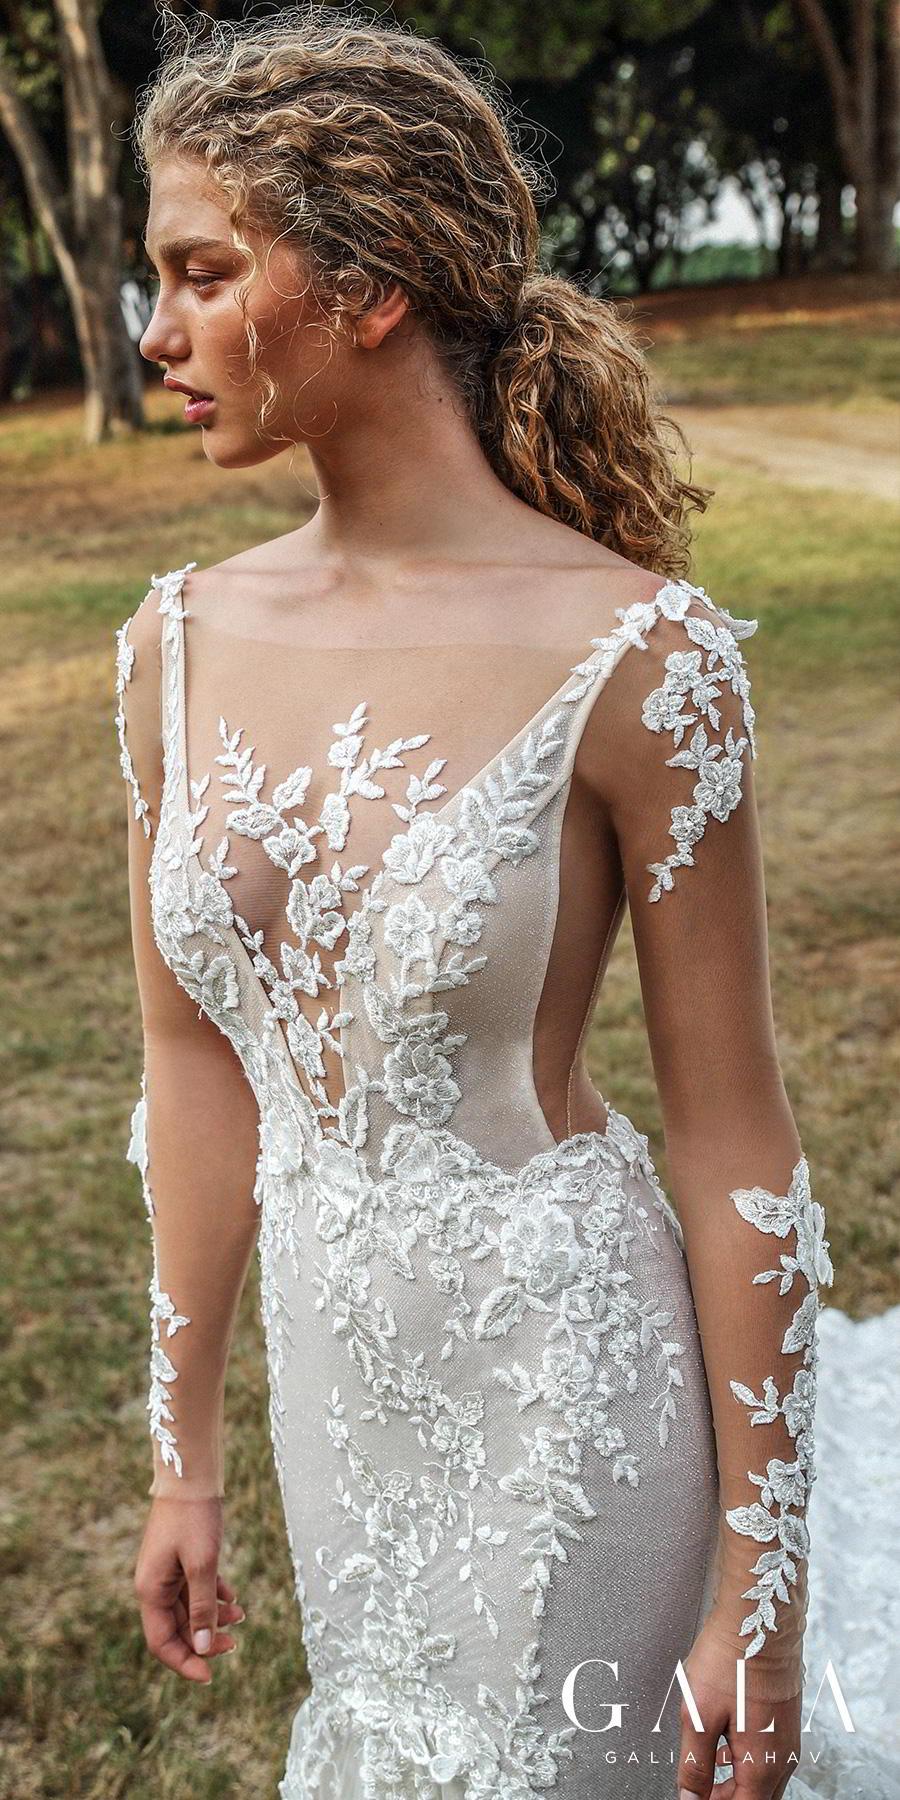 galia lahav gala fall 2019 bridal long sleeves deep v neck full embellishment elegant beautiful mermaid wedding dress backless low open back chapel train (206) zv